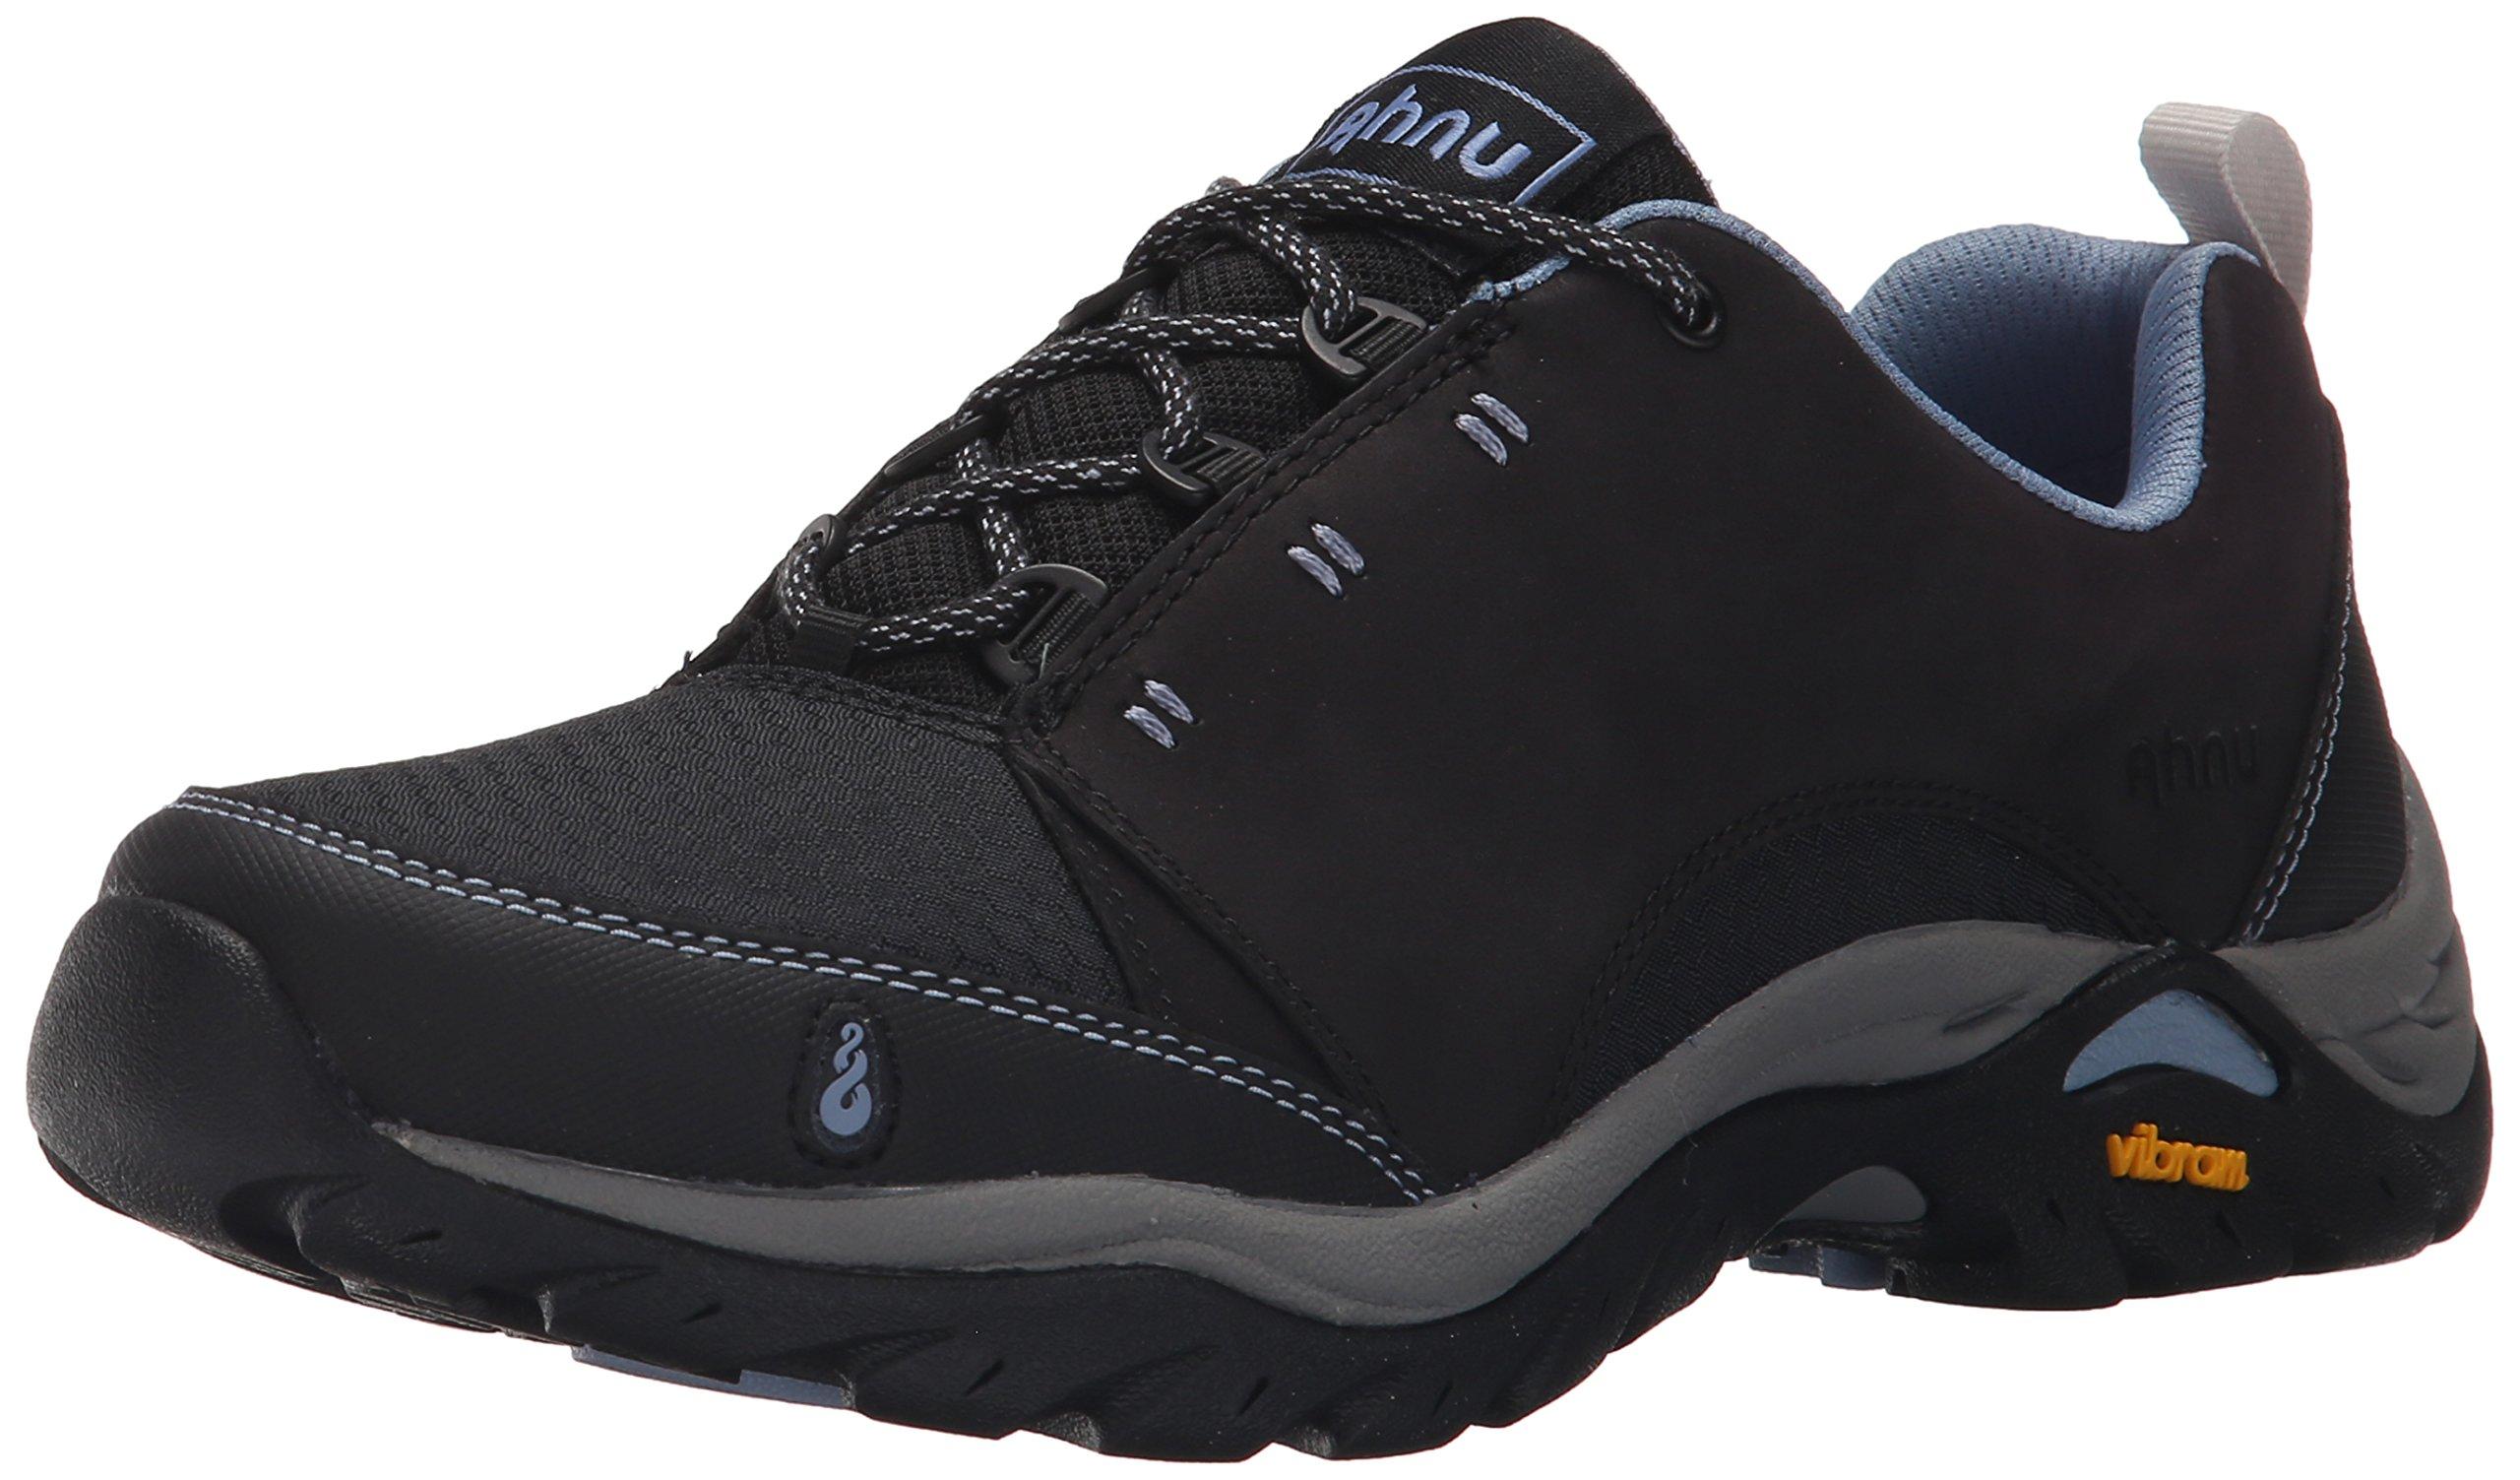 Ahnu Women's Montara Breeze Hiking Shoe, Black, 6.5 M US